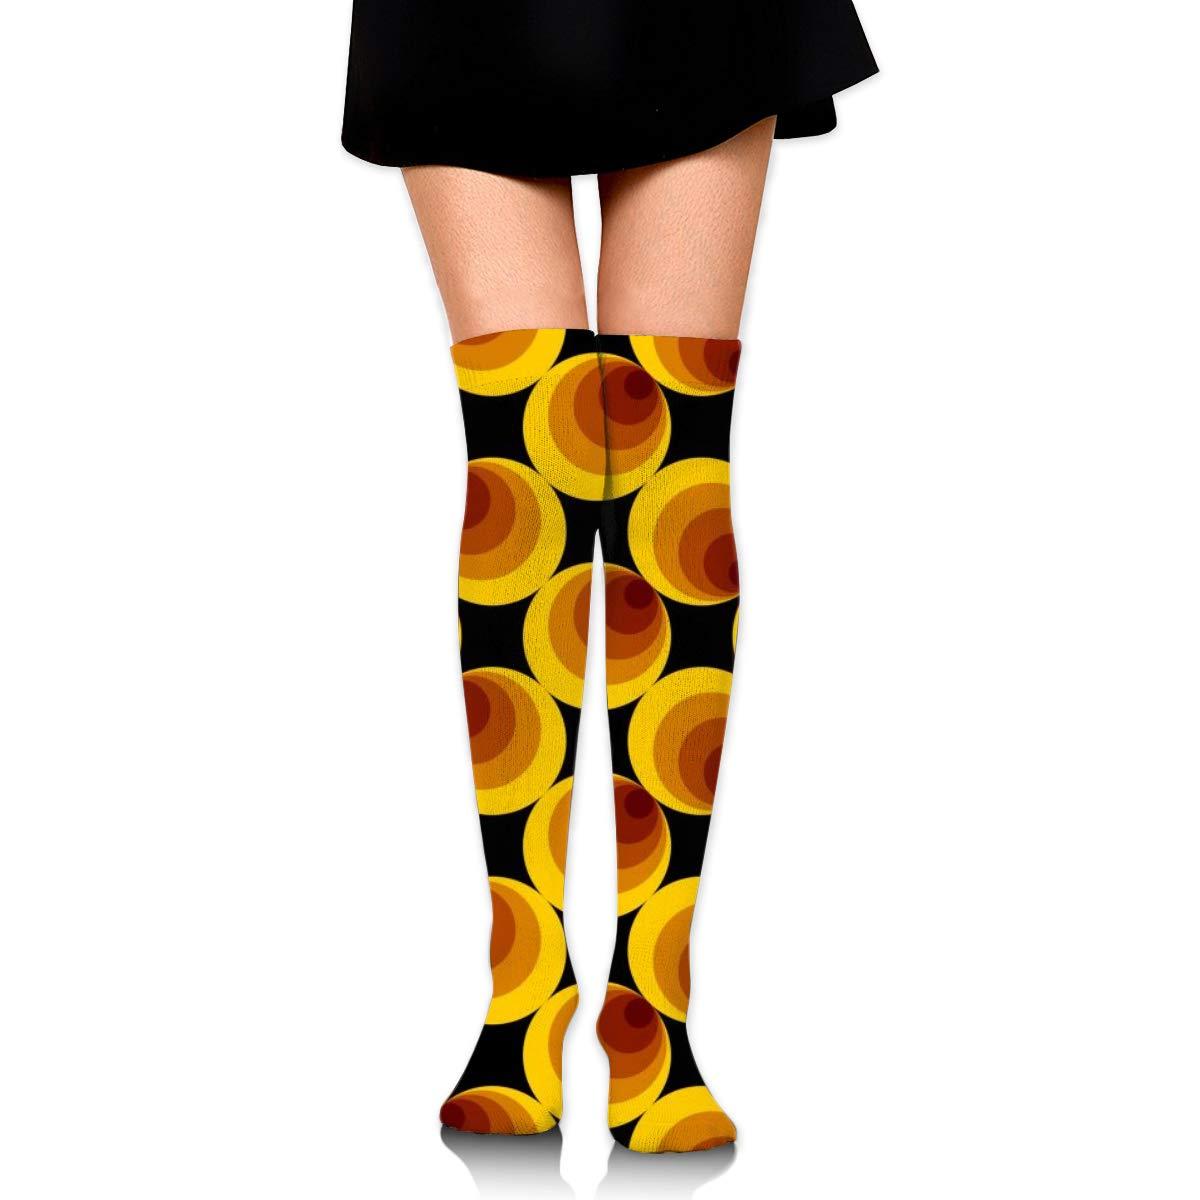 Women Crew Socks Thigh High Knee Yellow Circles Long Tube Dress Legging Casual Compression Stocking